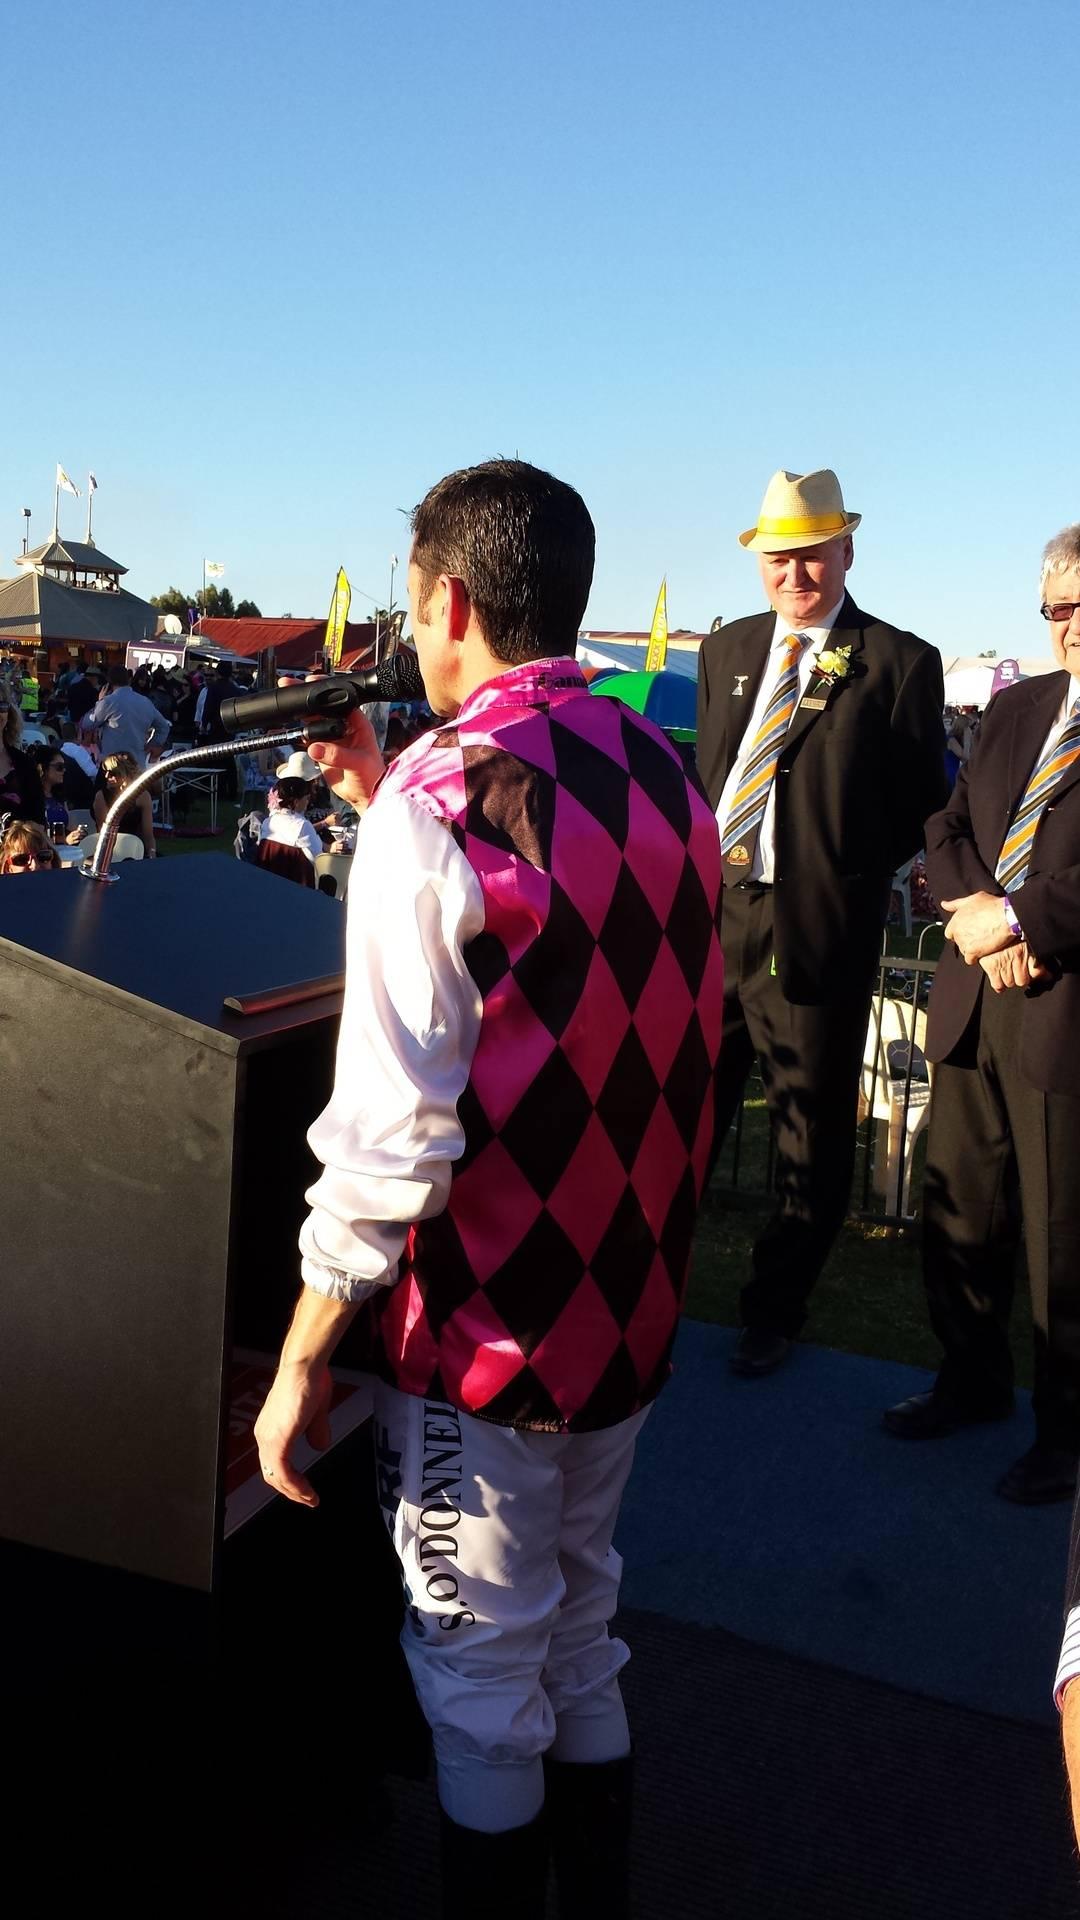 Shaun's winning jockey speech